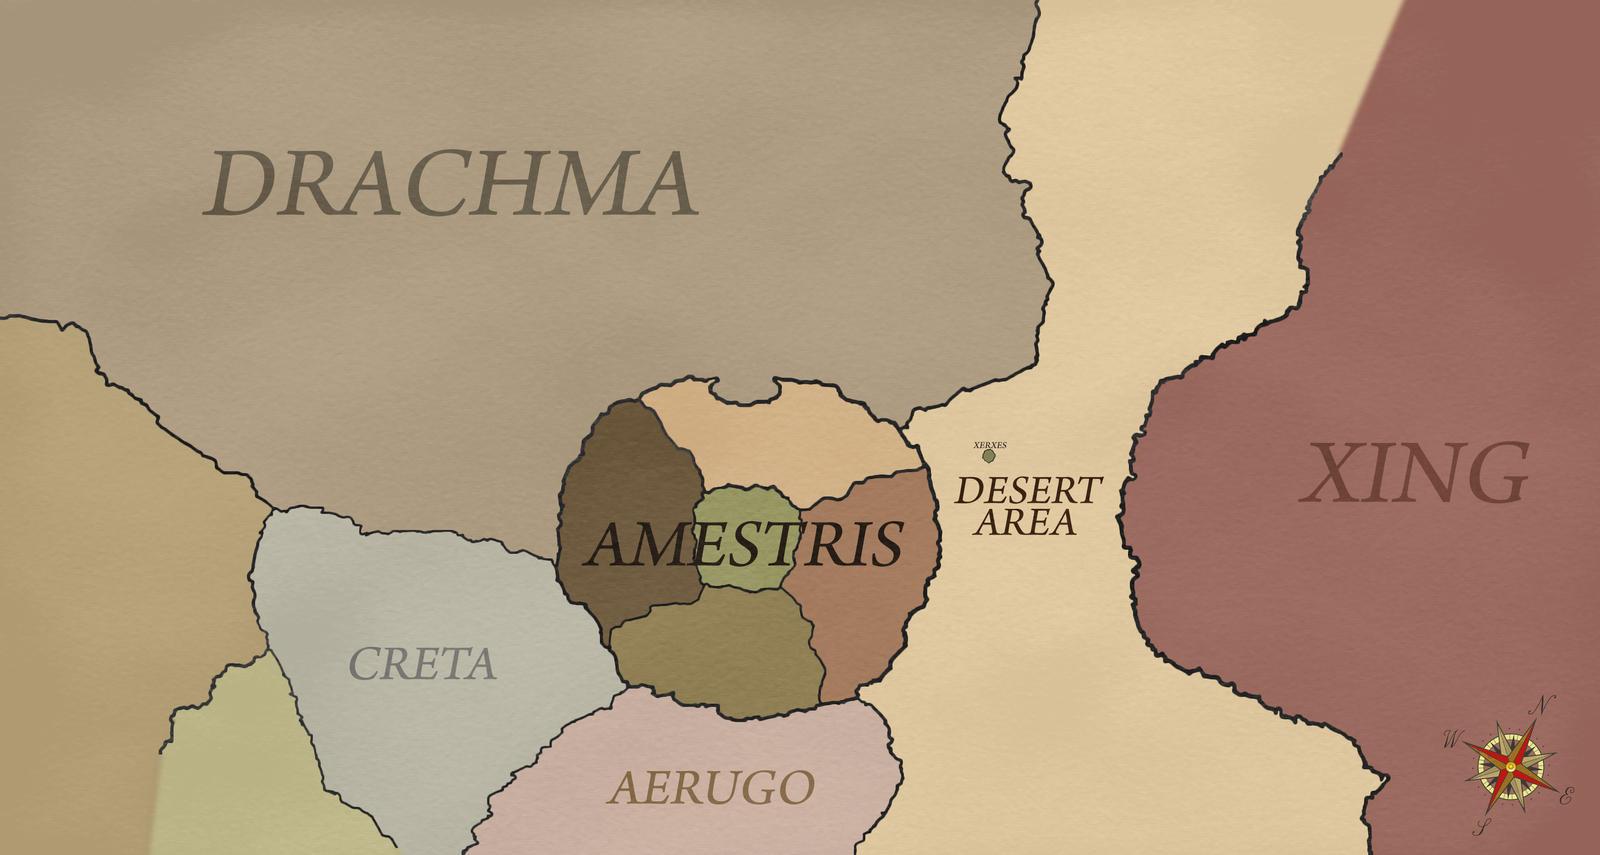 Amestris Map by PosterMasterChef on DeviantArt